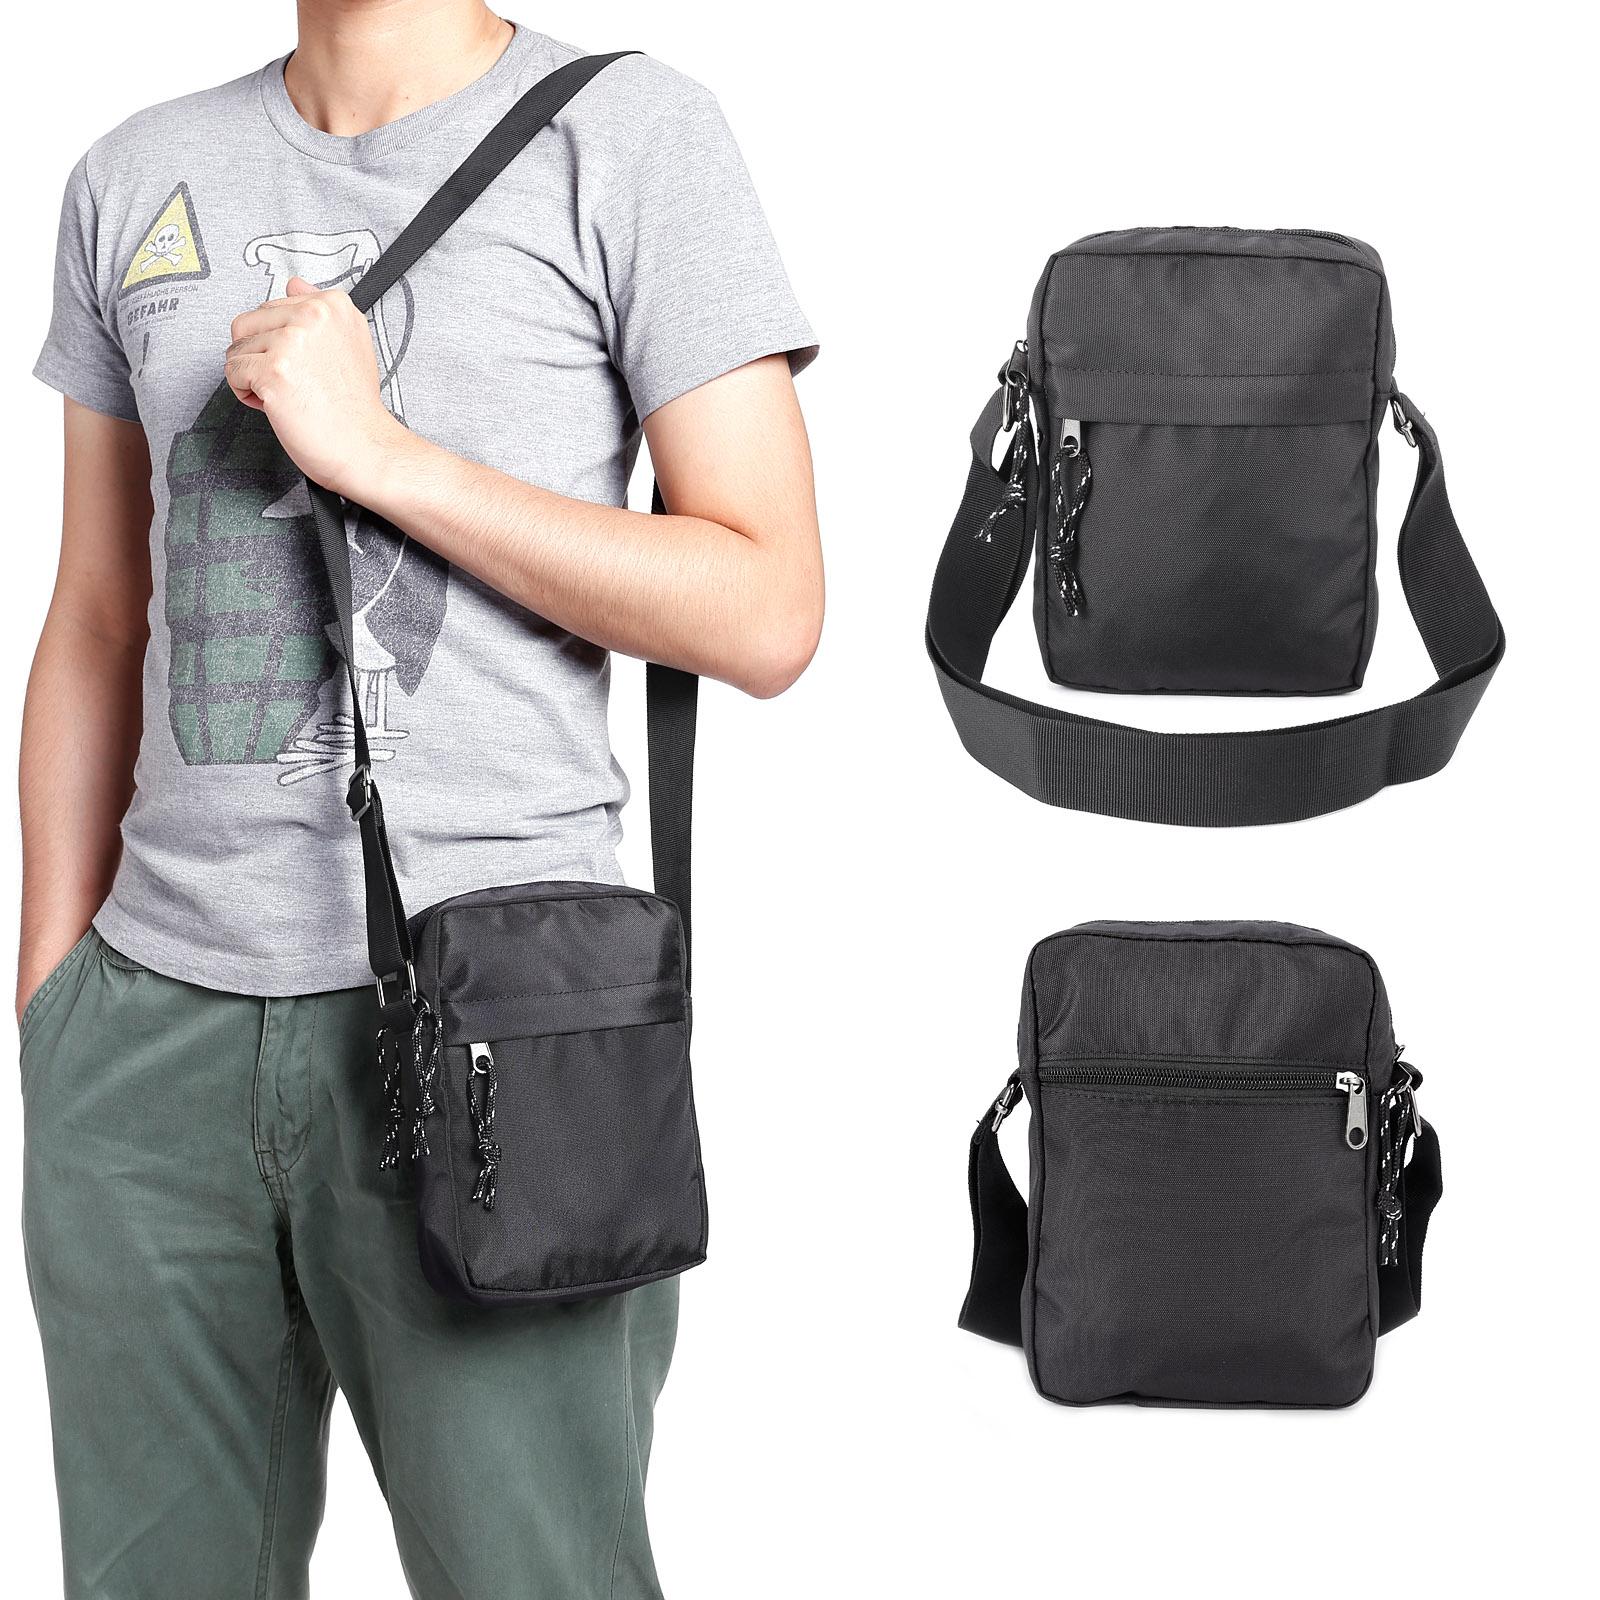 ed48e716c16f Mens Gents Waterproof Shoulder Bag Cross Body Messenger Travel Bag ...